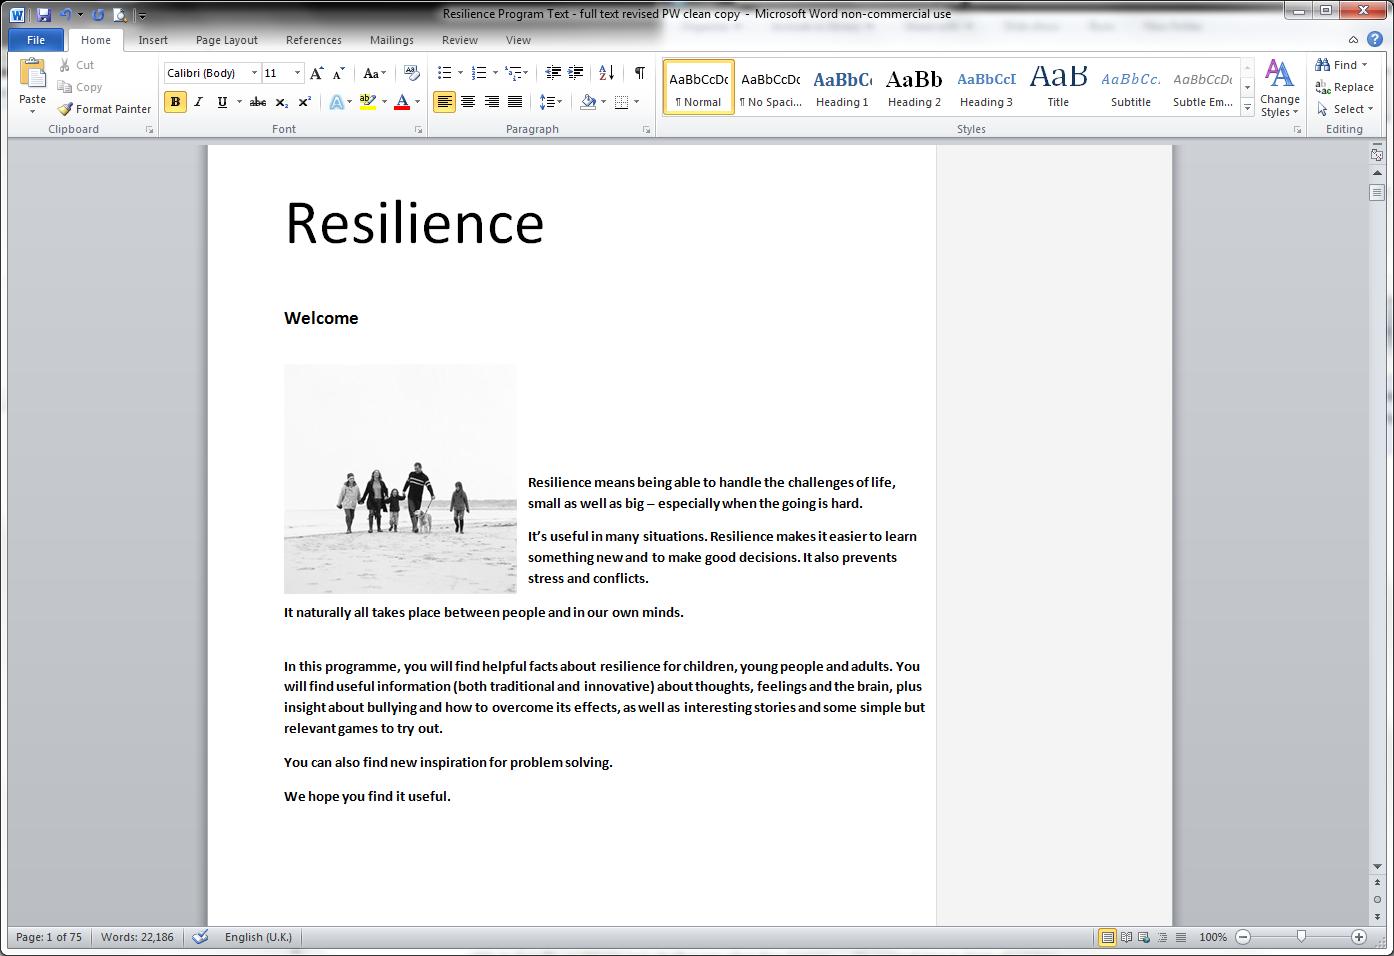 NHS Resilience Programme brochure